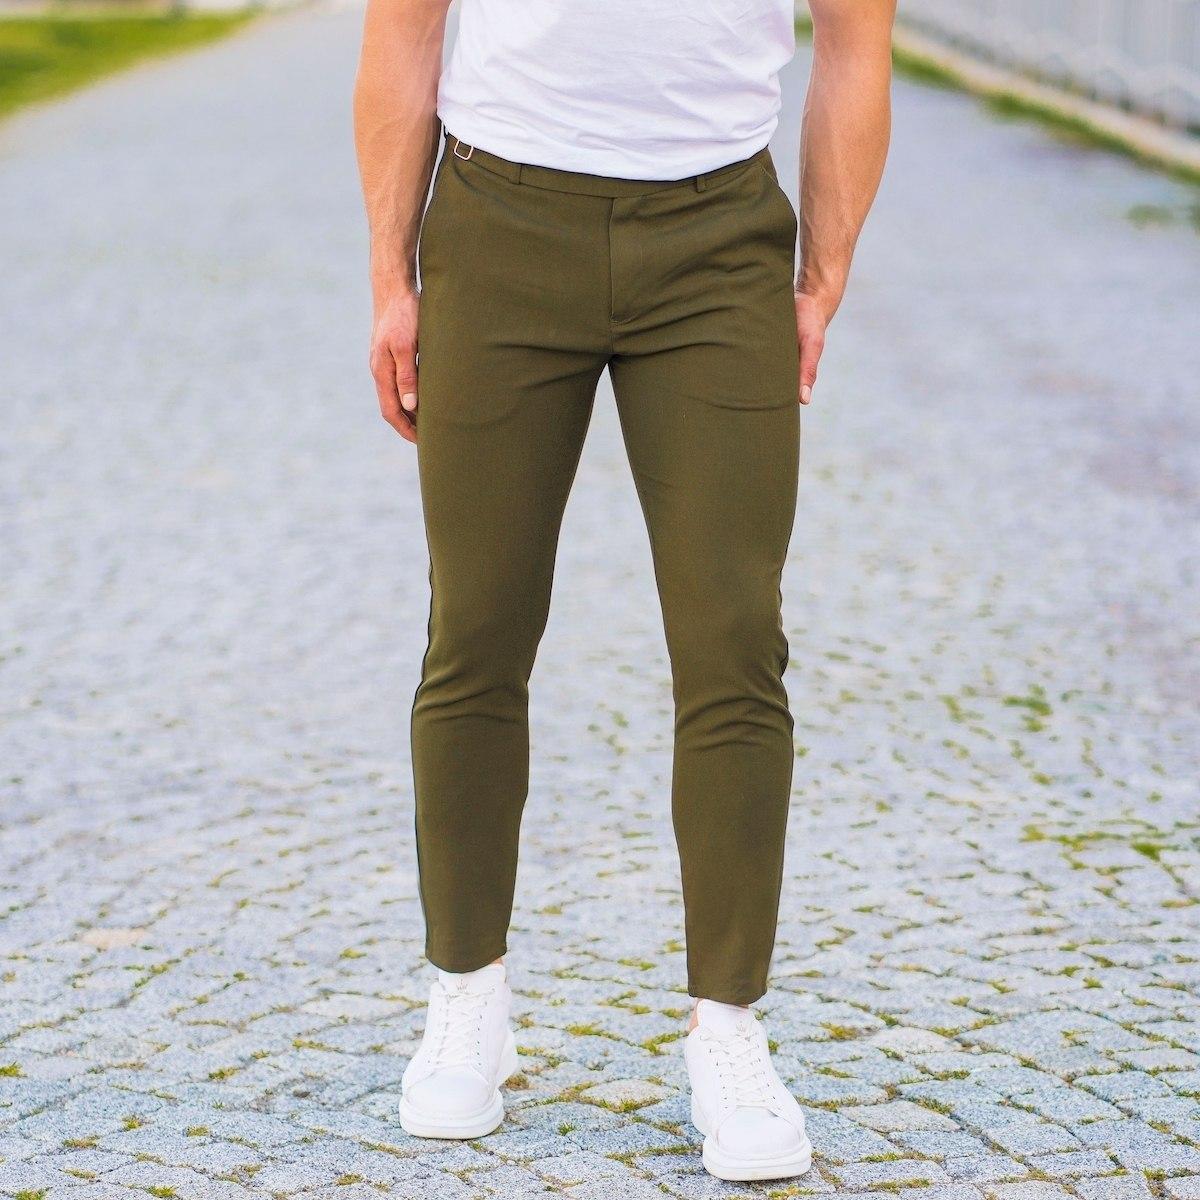 Herren Slim-Fit Hose in khaki